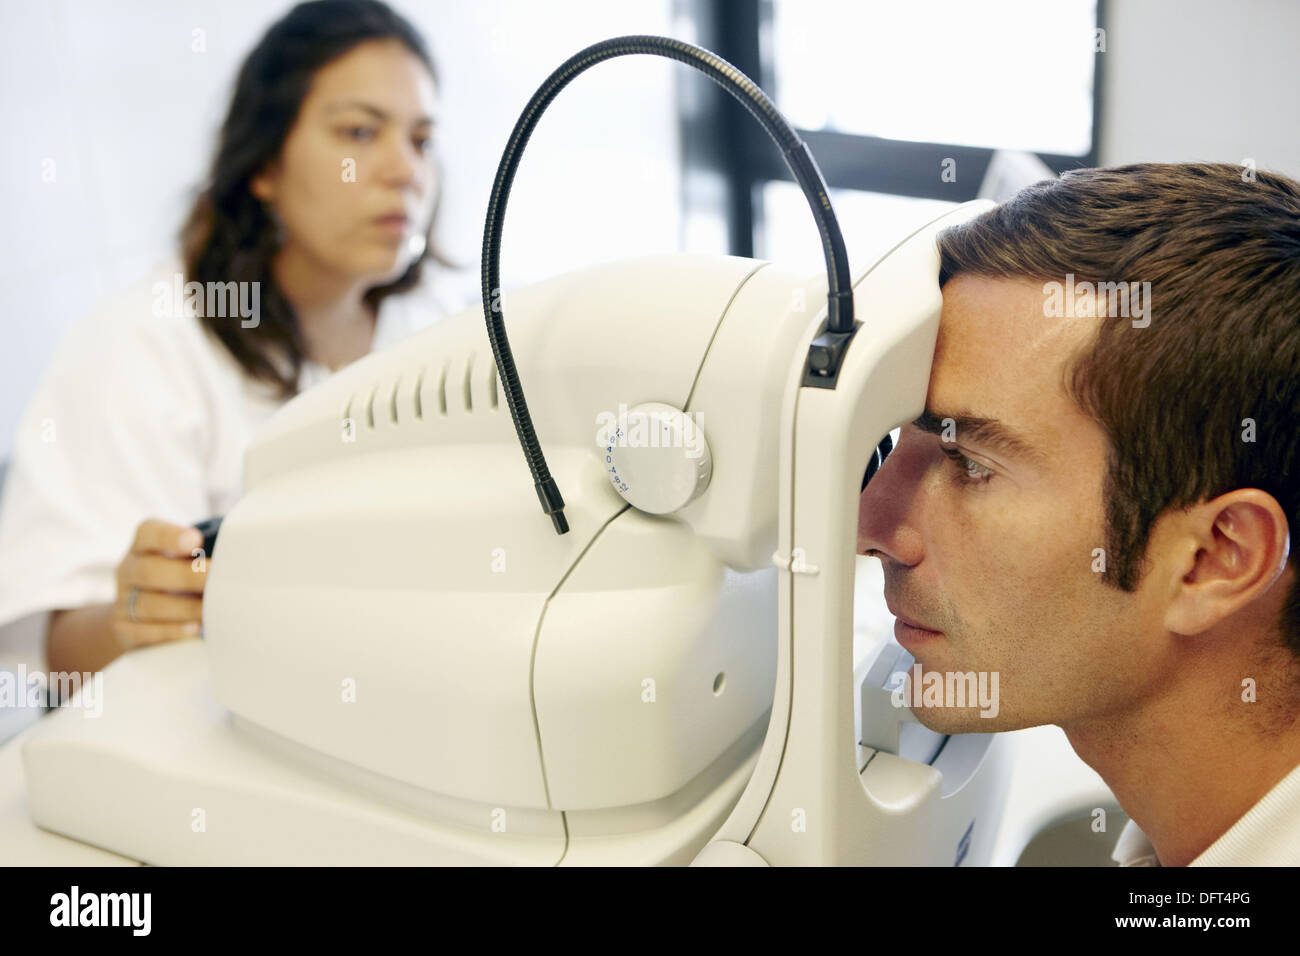 Ophthalmology. Hospital Universitario de Gran Canaria Doctor Negrin, Las Palmas de Gran Canaria. Canary Islands, Spain - Stock Image